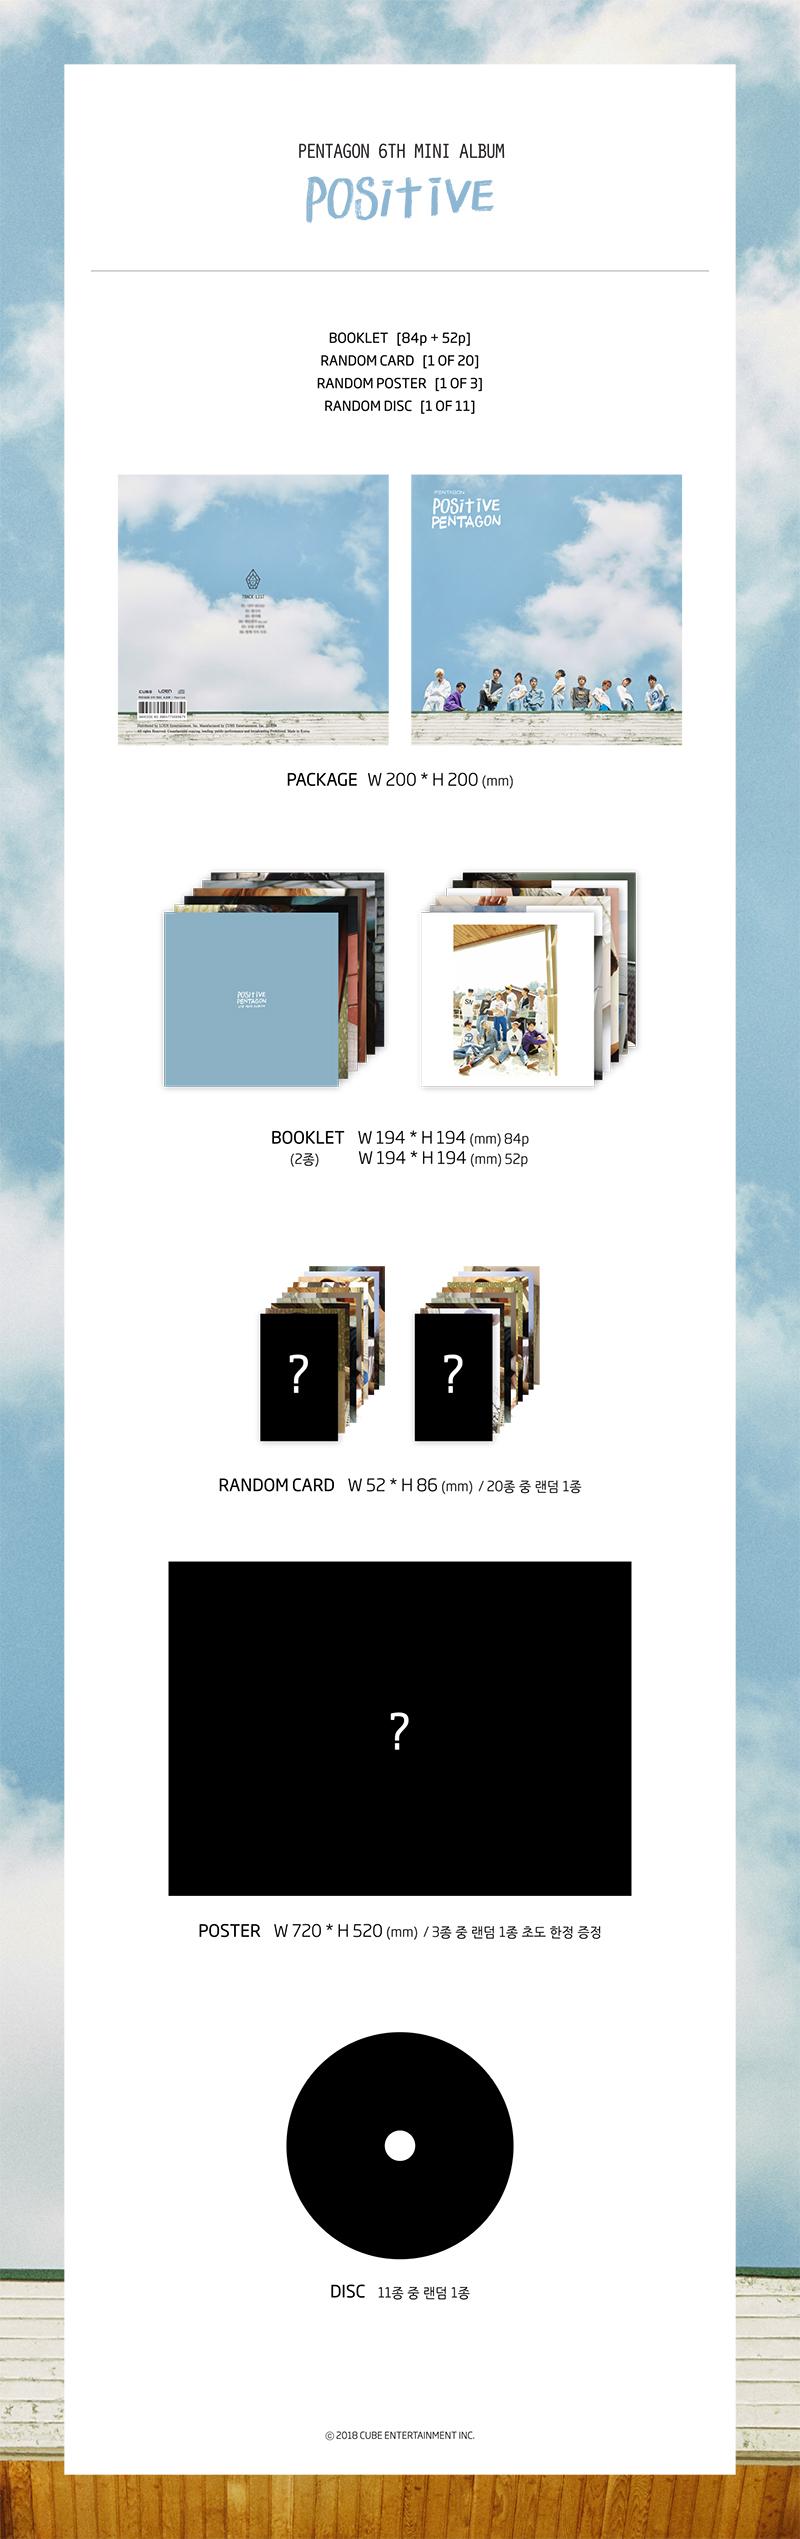 6th Mini Album CD+Photobook+Photocard+Poster NEW POSITIVE PENTAGON